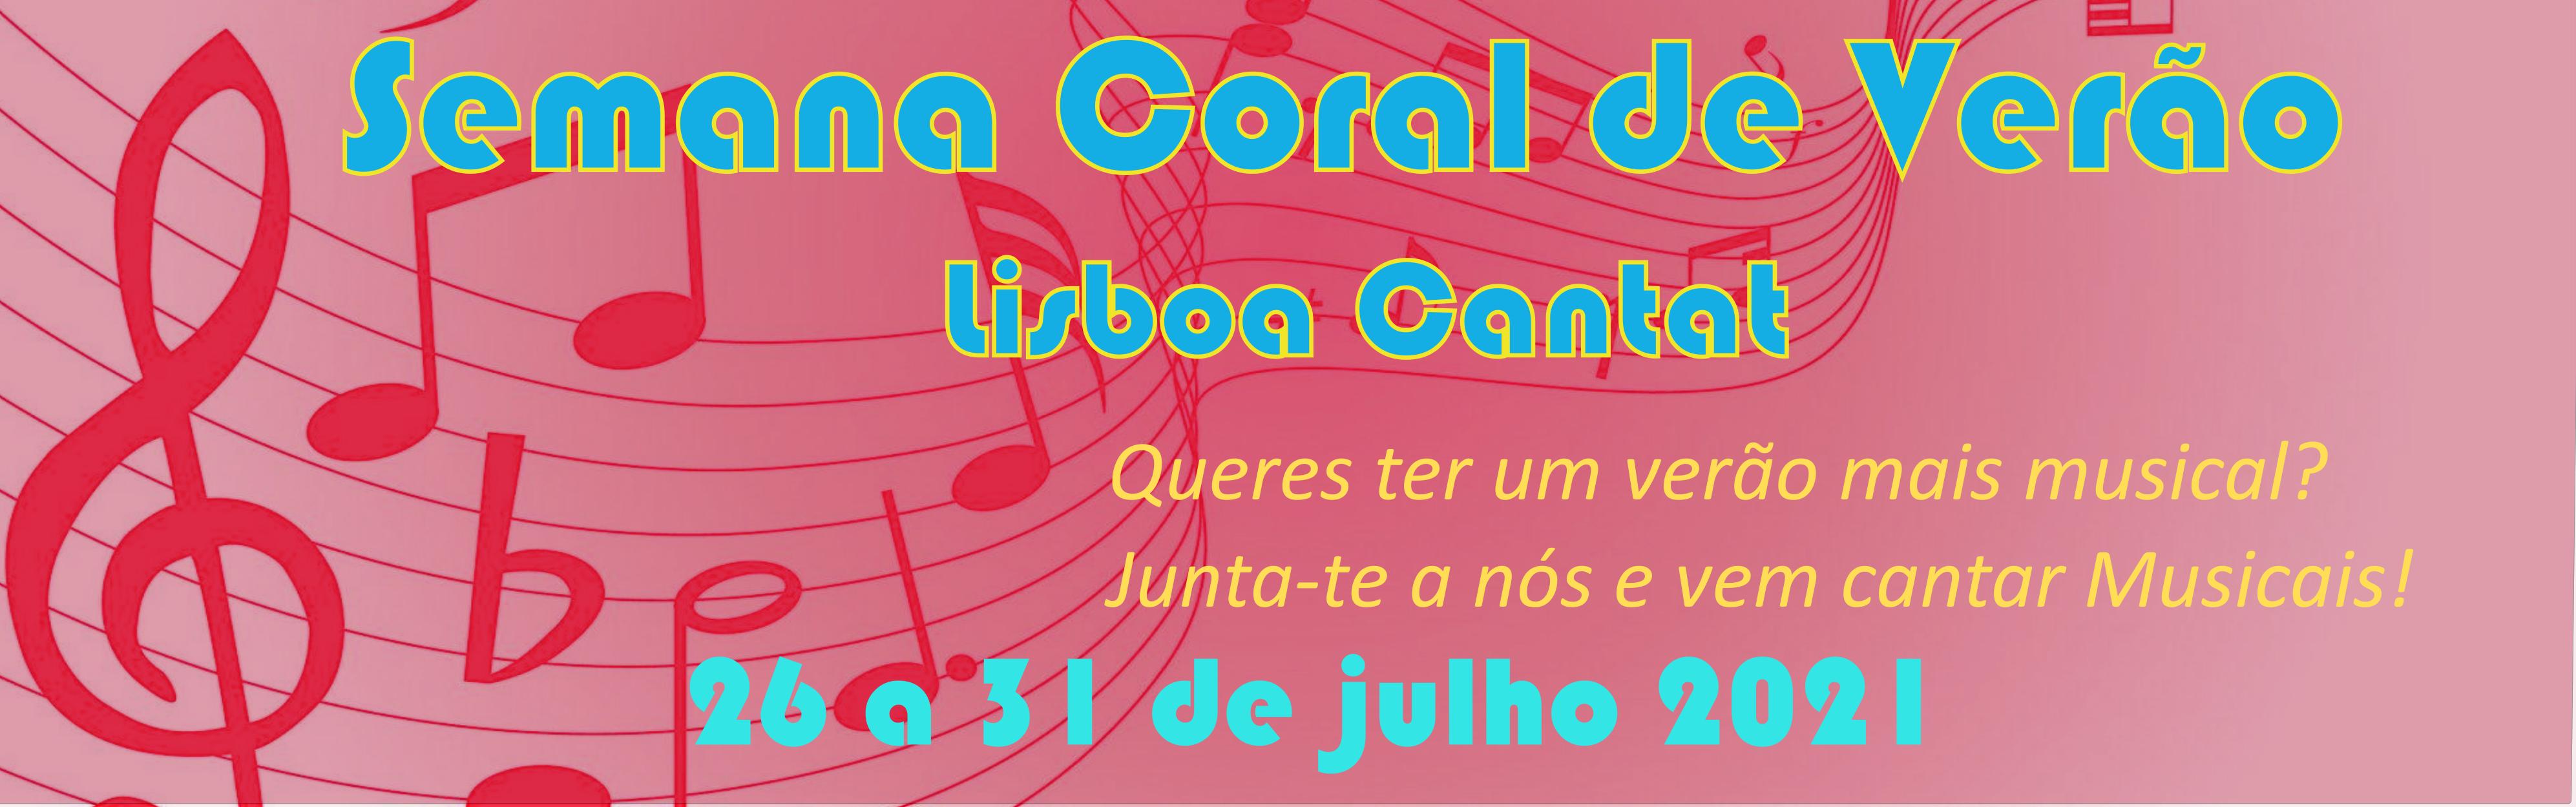 Semana Coral de Verão  Lisboa Cantat